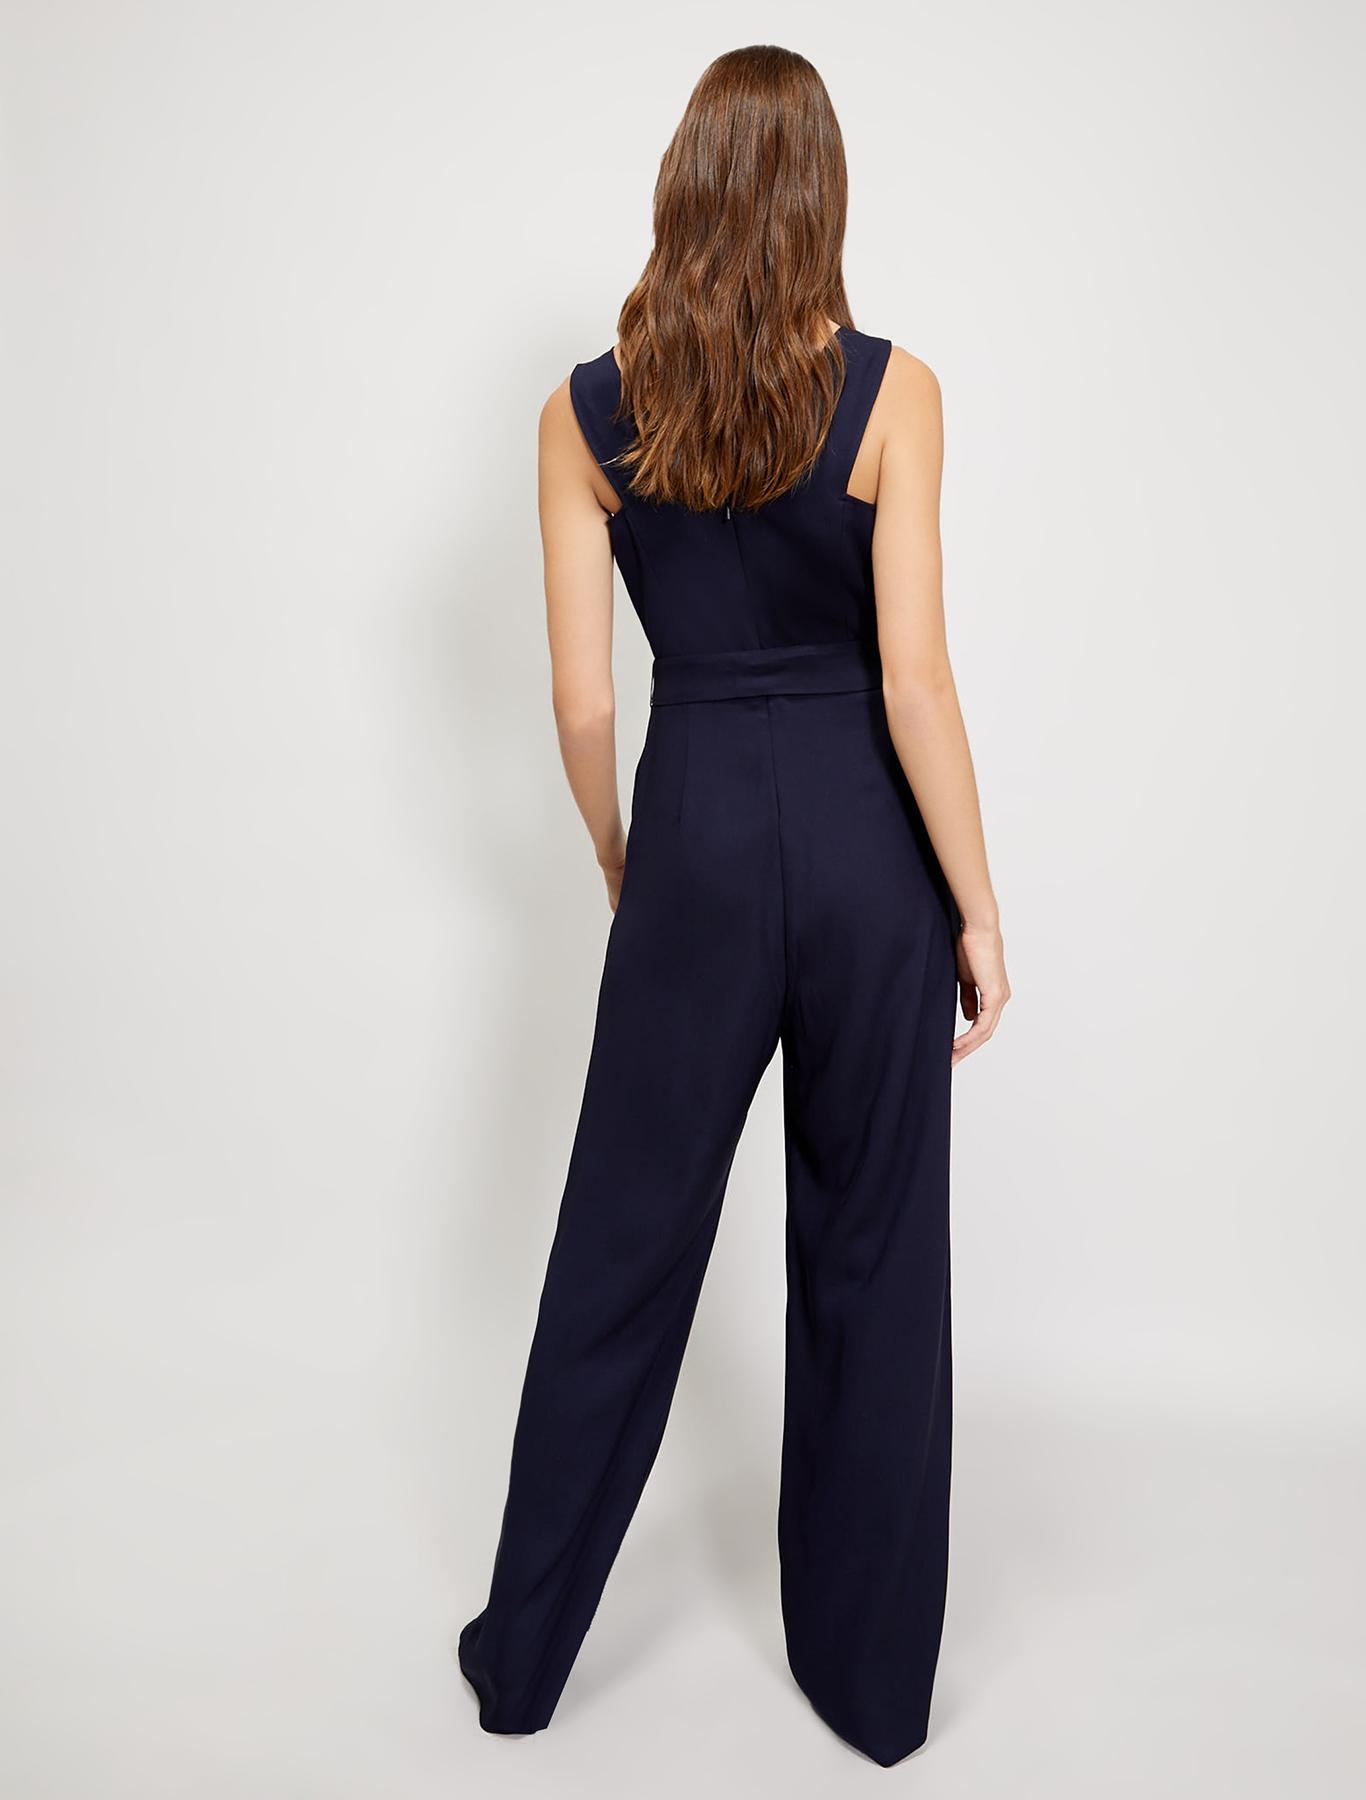 Cady jumpsuit with belt - navy blue - pennyblack